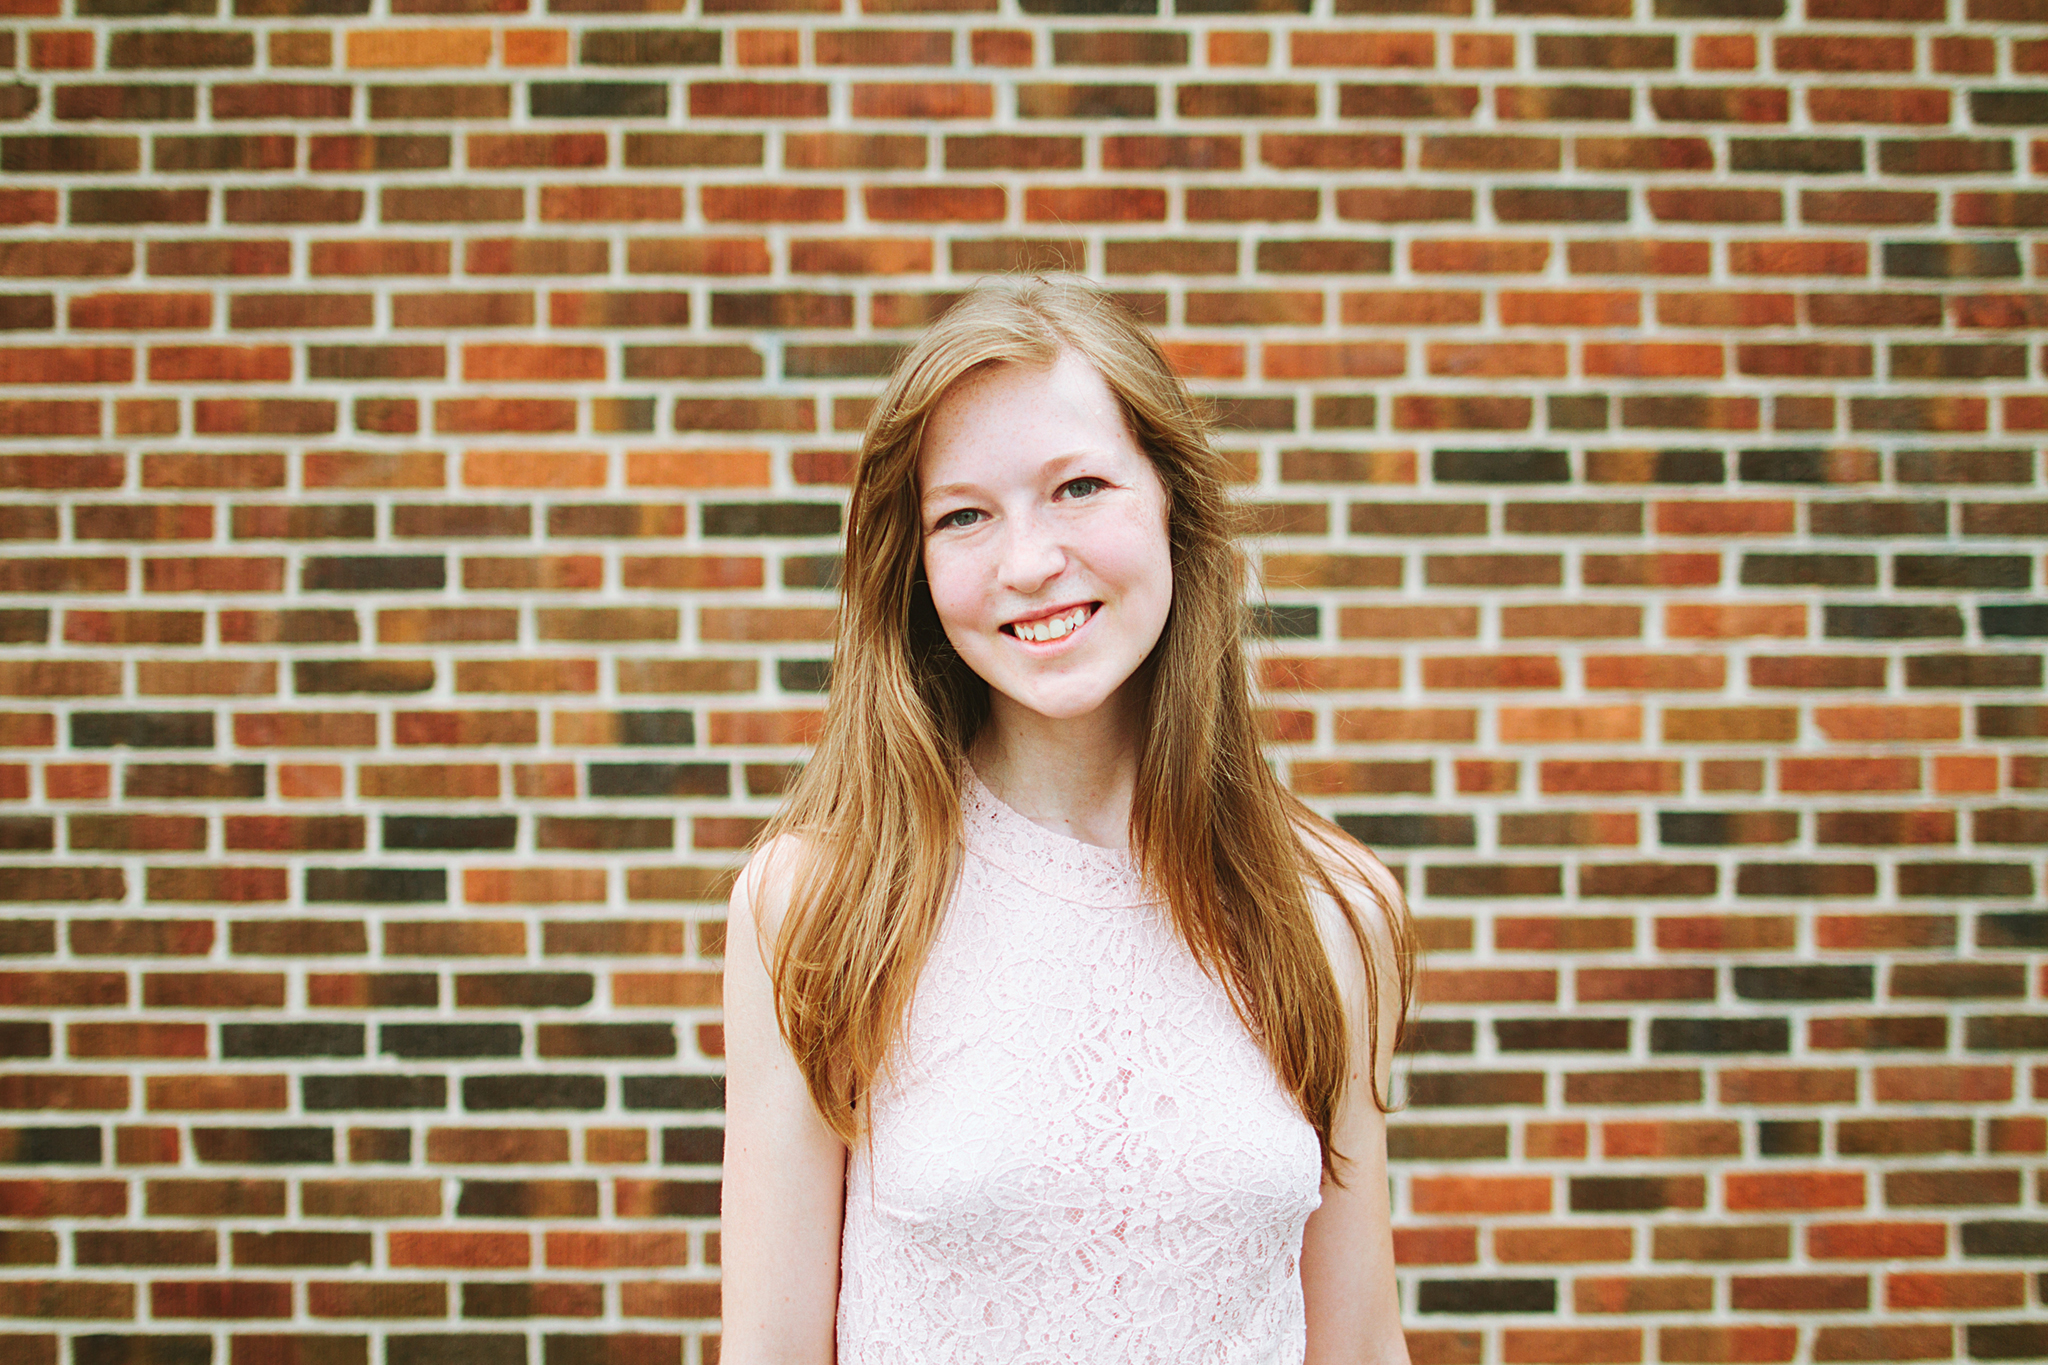 Snoqualmie High School Senior Portrait Photographer